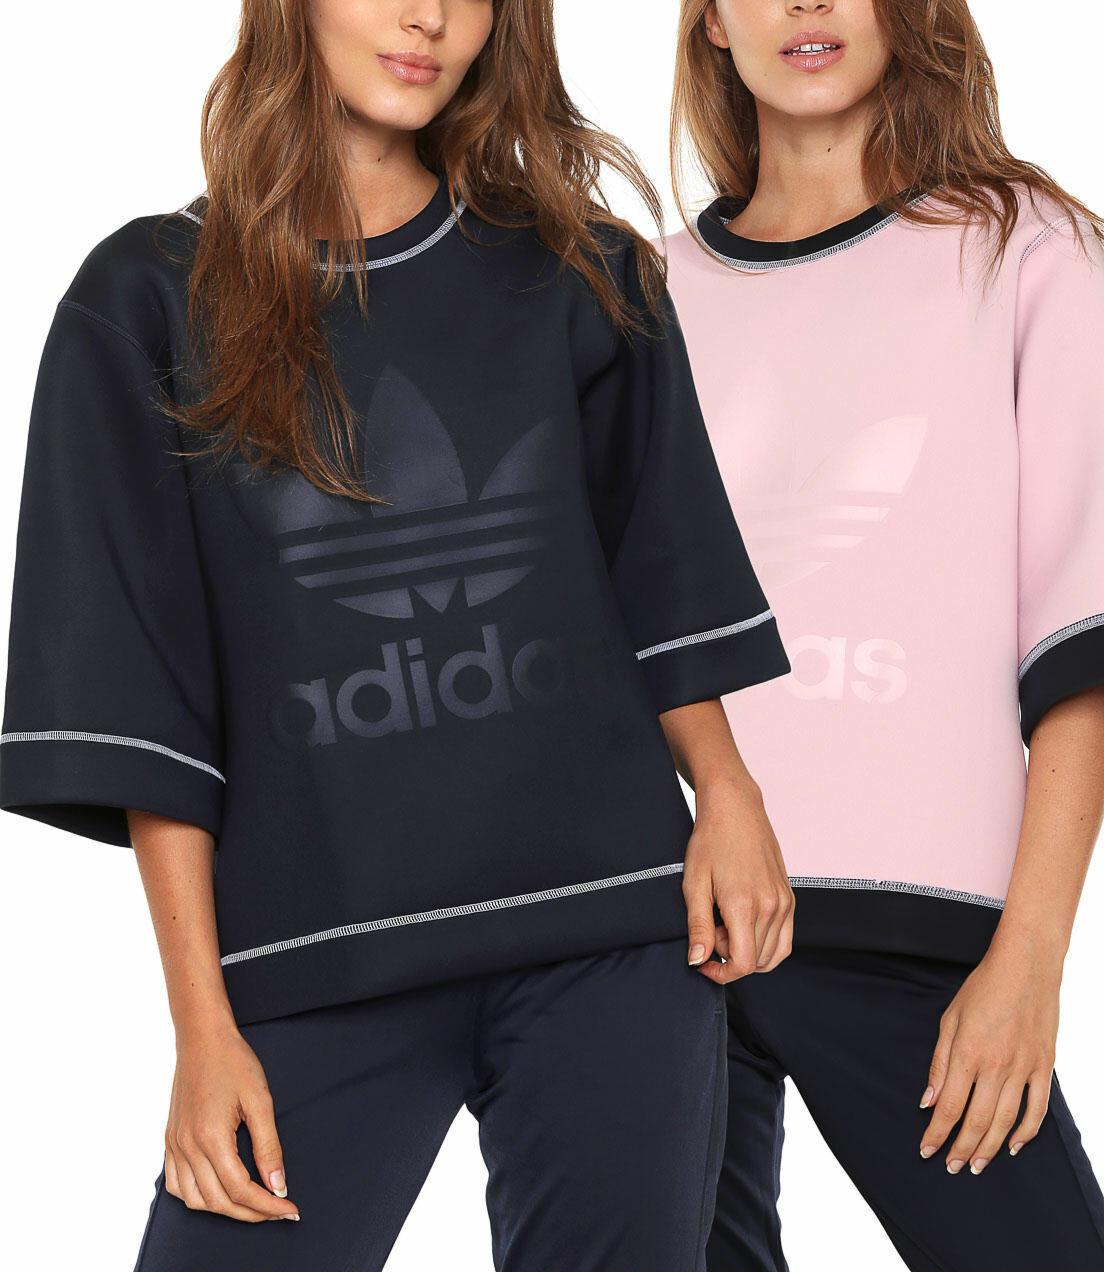 Adidas Originals Womens NMD Reversible Trefoil Logo Sweatshirt Top Neoprene Tee